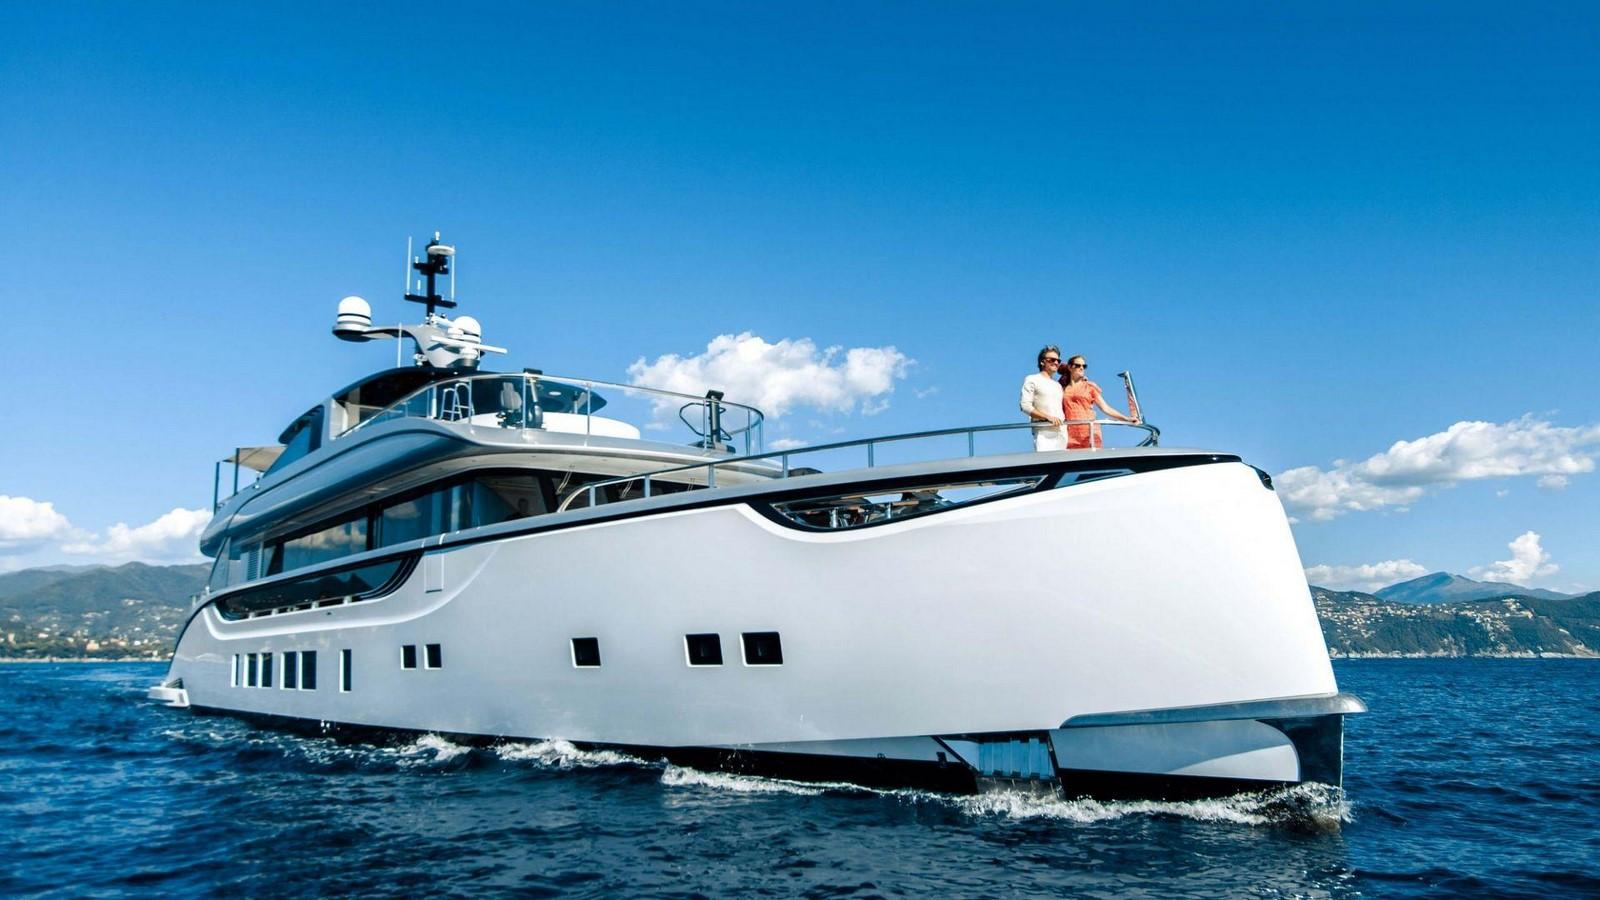 porsche-design-dynamiq-gtt-115-hybrid-superyacht